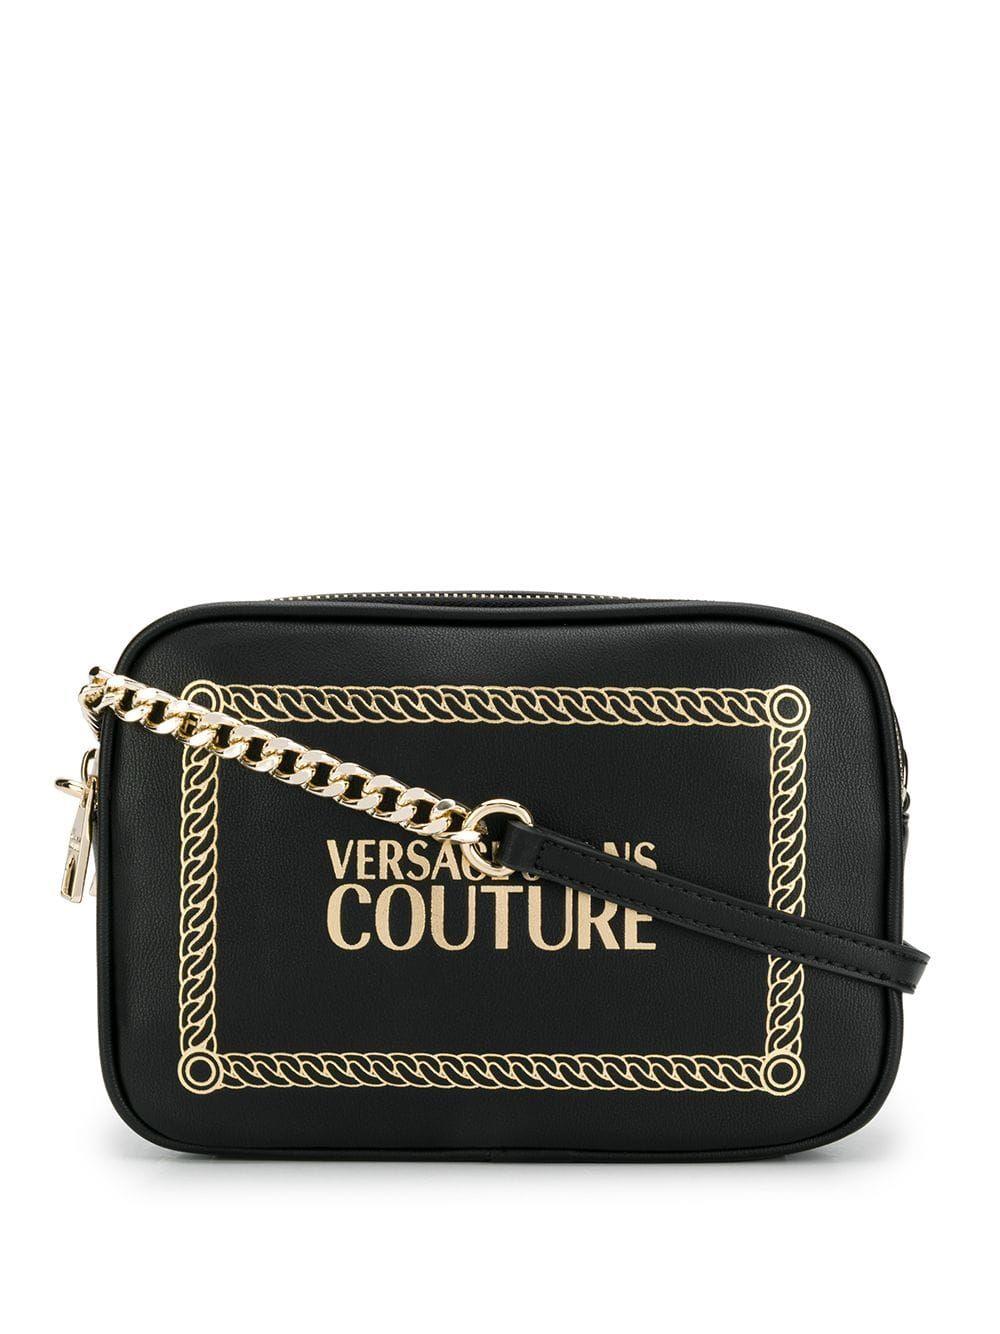 Versace Jeans Couture logo crossbody bag Black | Versace